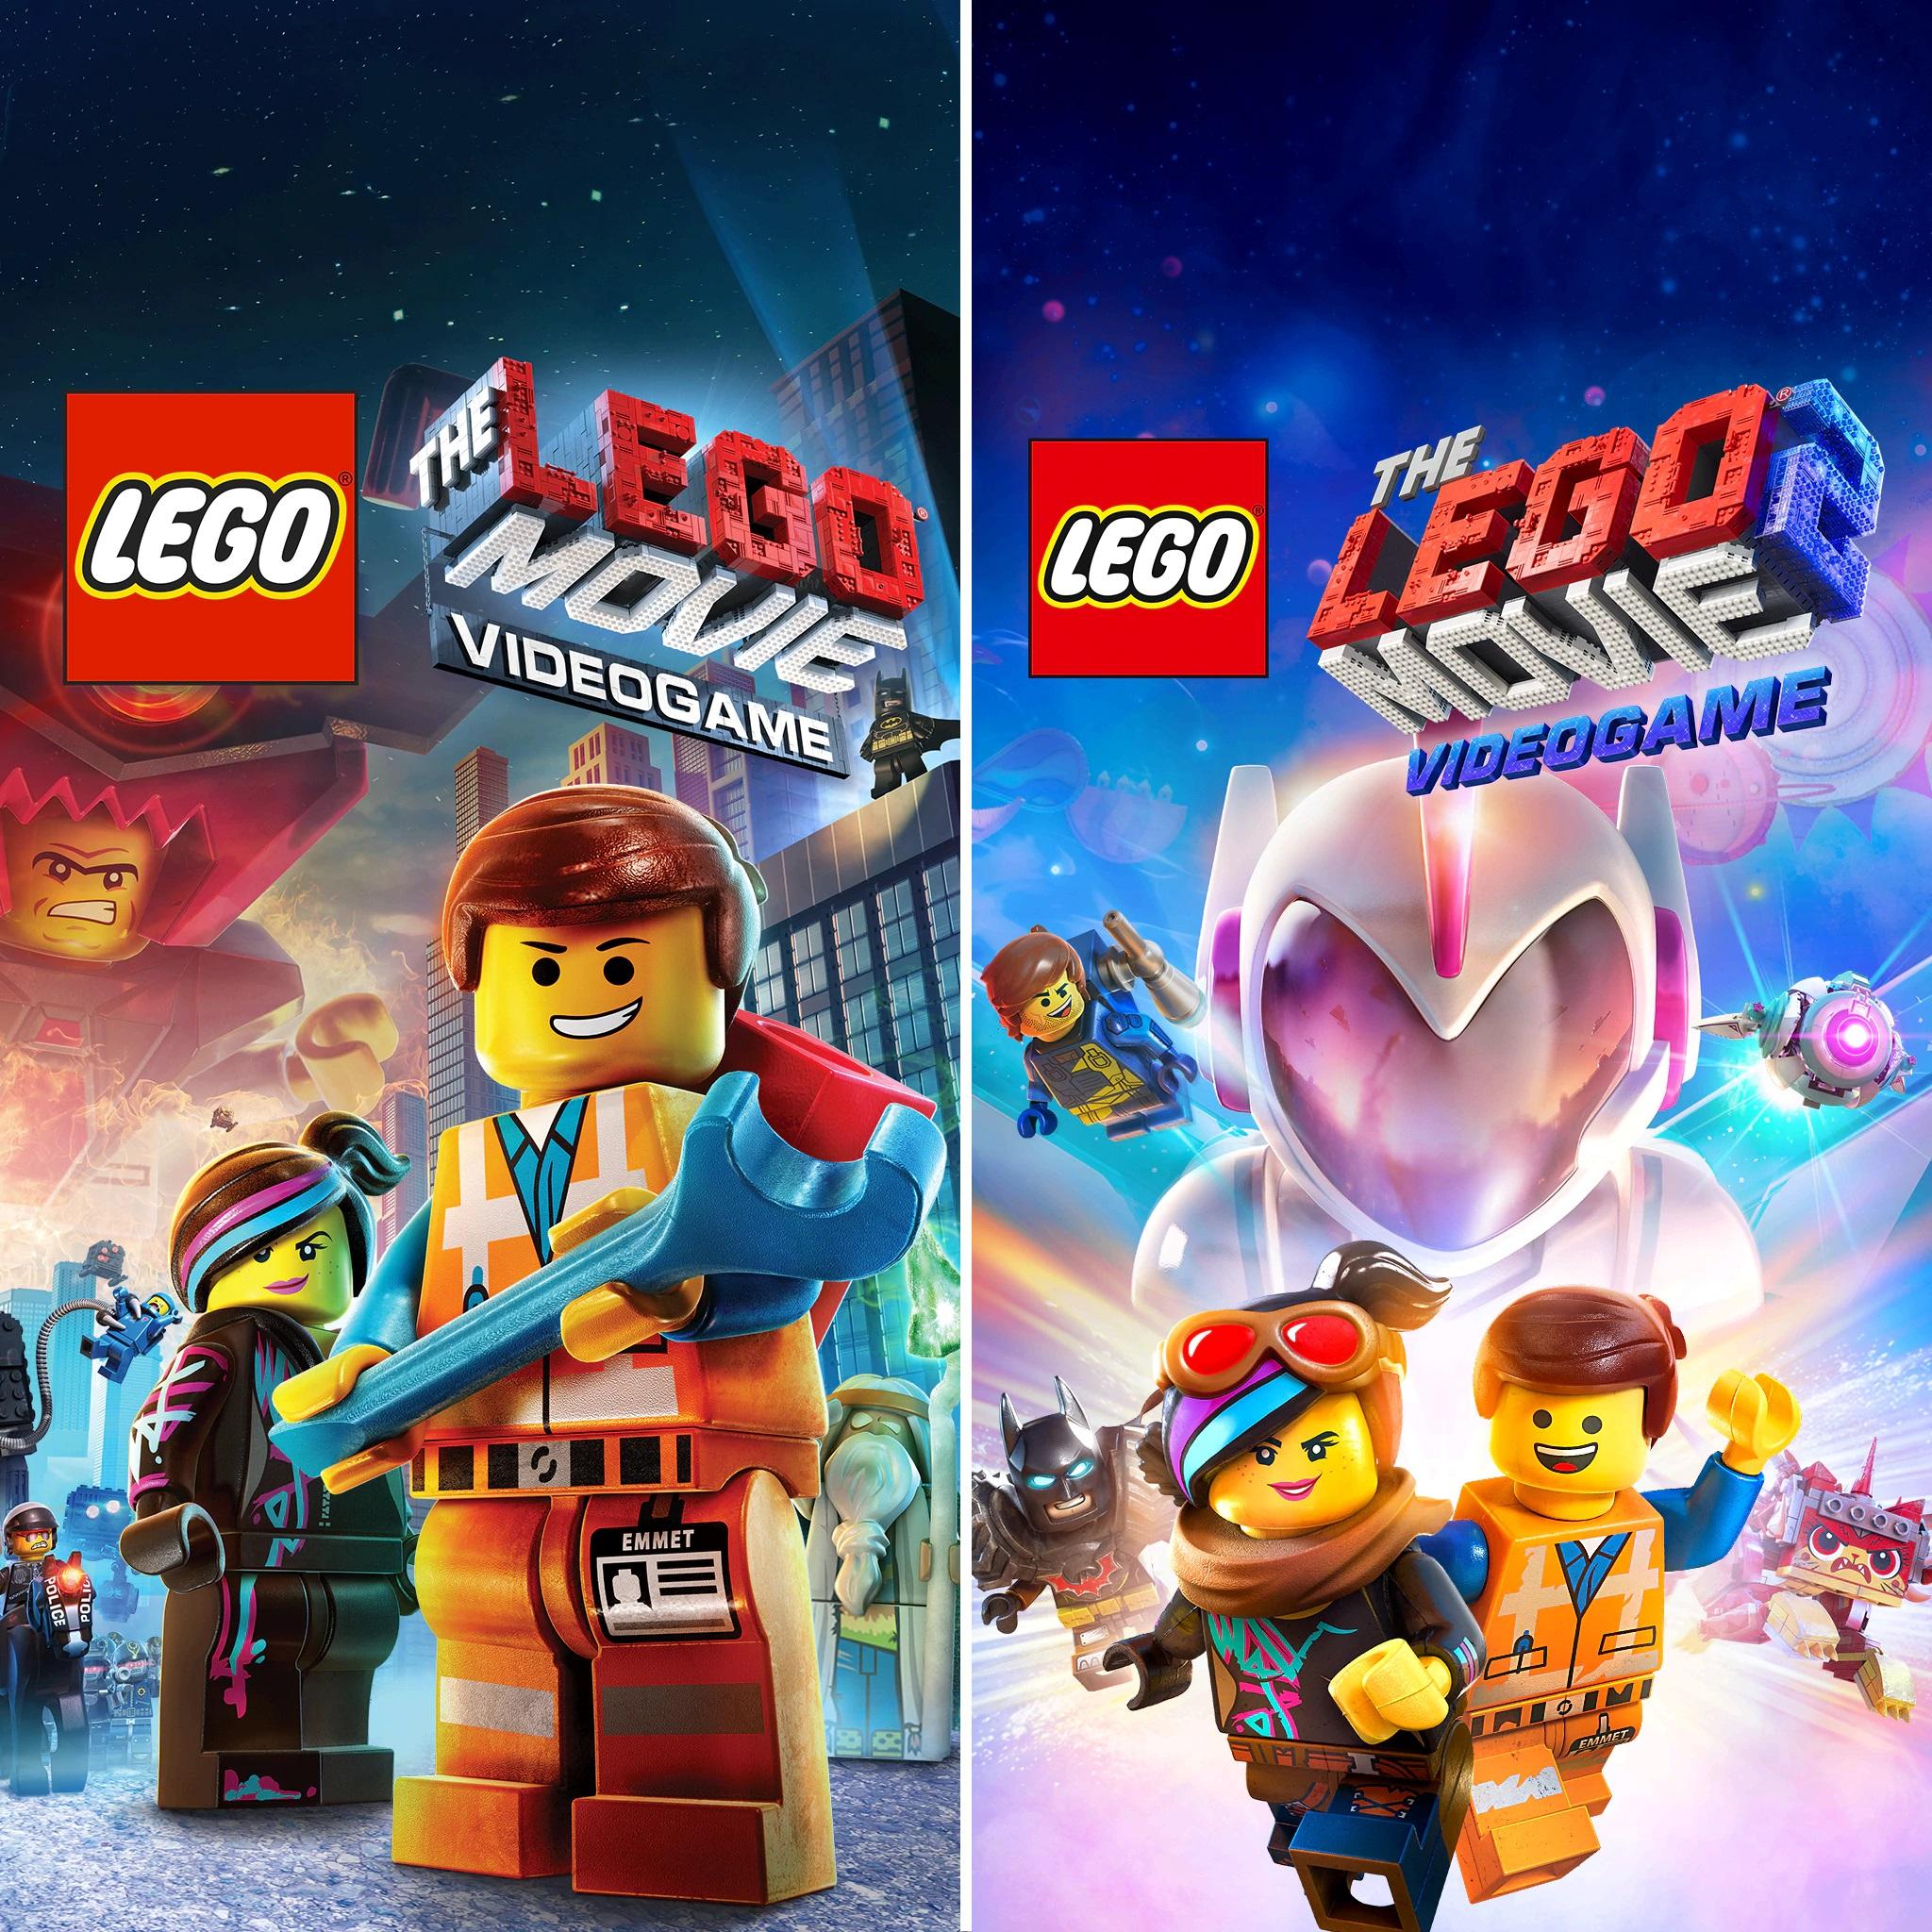 PS4 - The LEGO® Movie Videogame-bundel